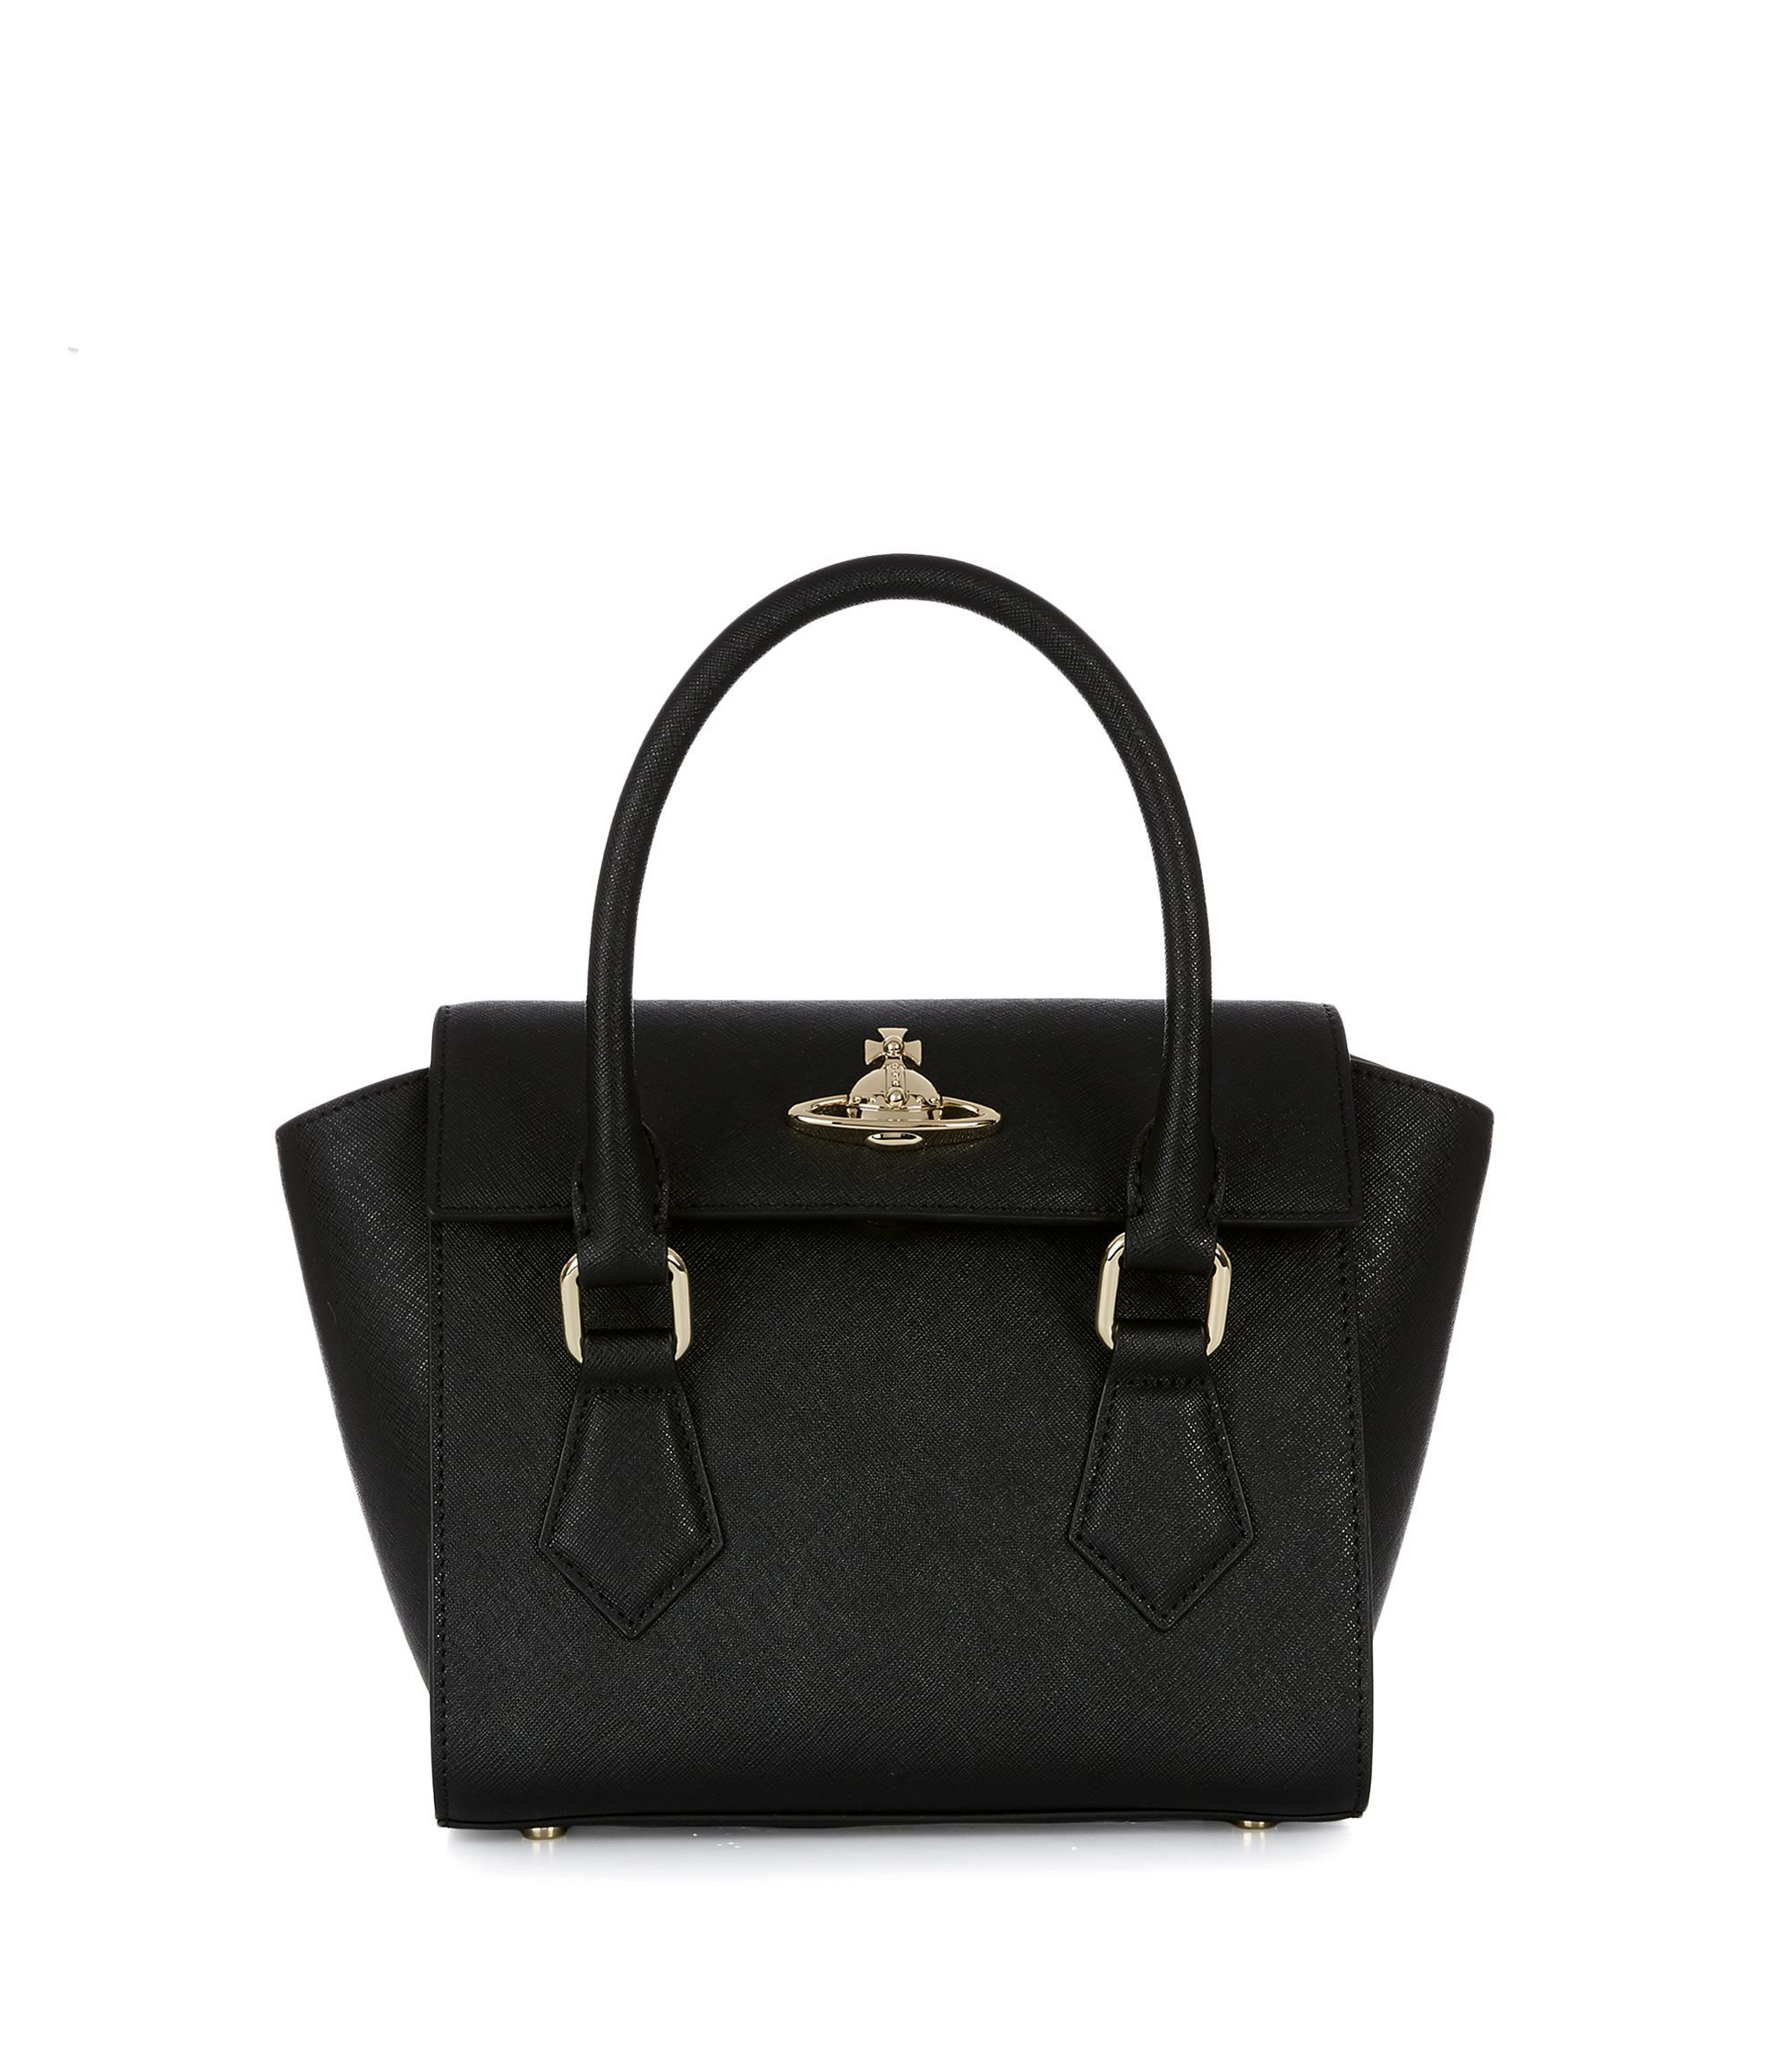 91cac70860 VIVIENNE WESTWOOD Small Pimlico Handbag 42010032 Black.  viviennewestwood   bags  leather